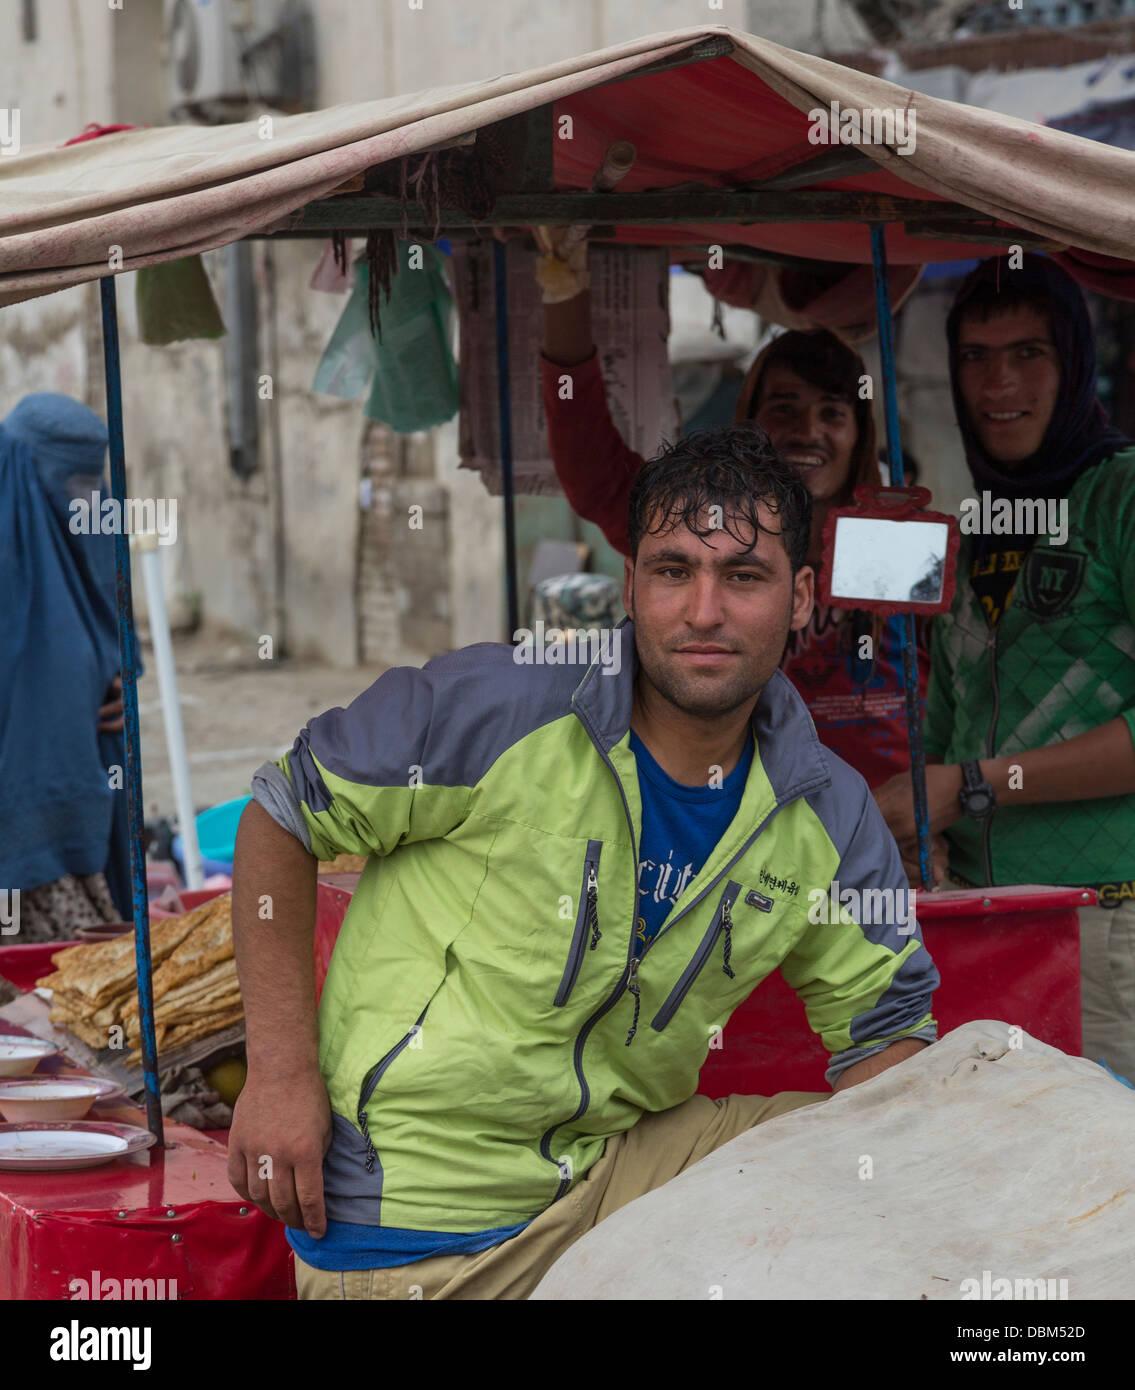 bazaar worker, Kabul, Afghanistan - Stock Image